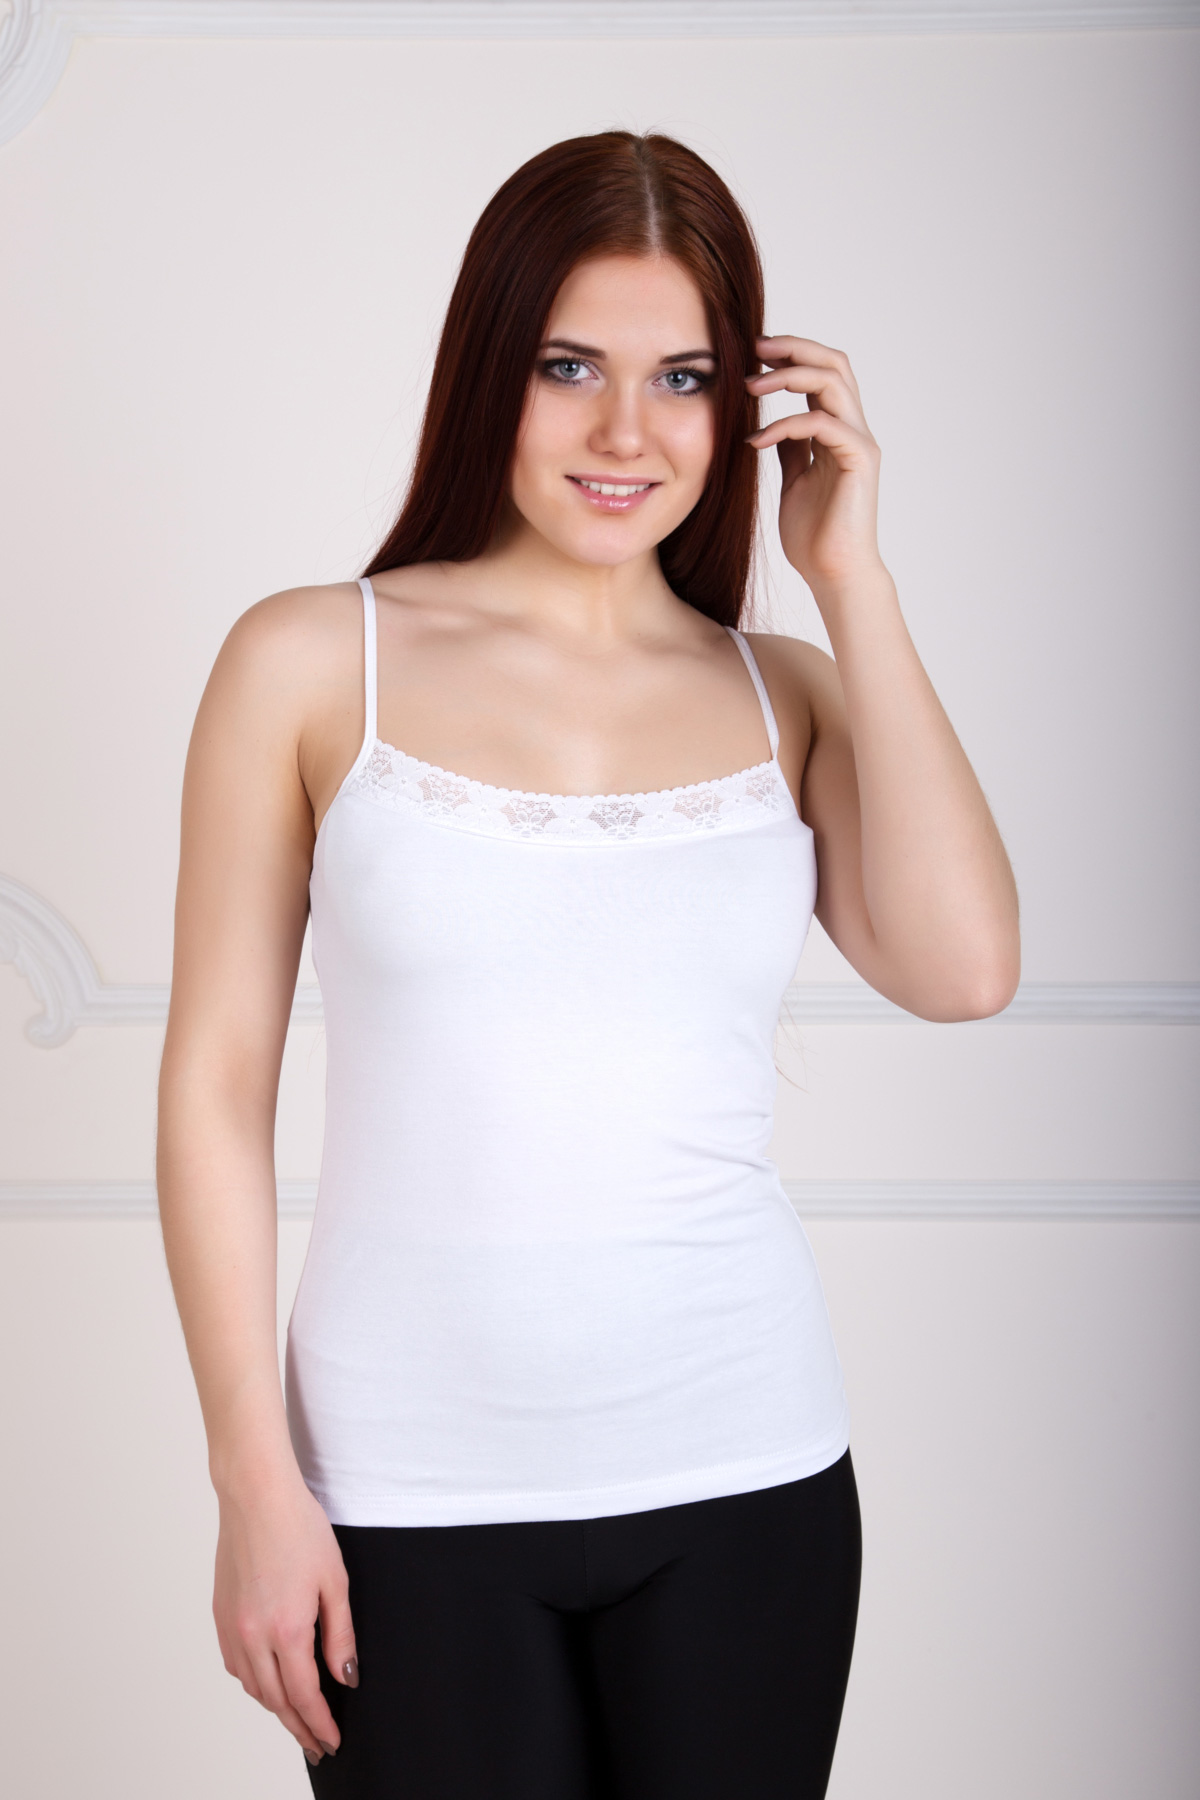 Жен. майка Бекки Белый р. 44Майки и футболки<br>Факт. ОГ: 70 см <br>Факт. ОТ: 70 см <br>Факт. ОБ: 78 см <br>Длина по спинке: 59 см<br><br>Тип: Жен. майка<br>Размер: 44<br>Материал: Фулайкра